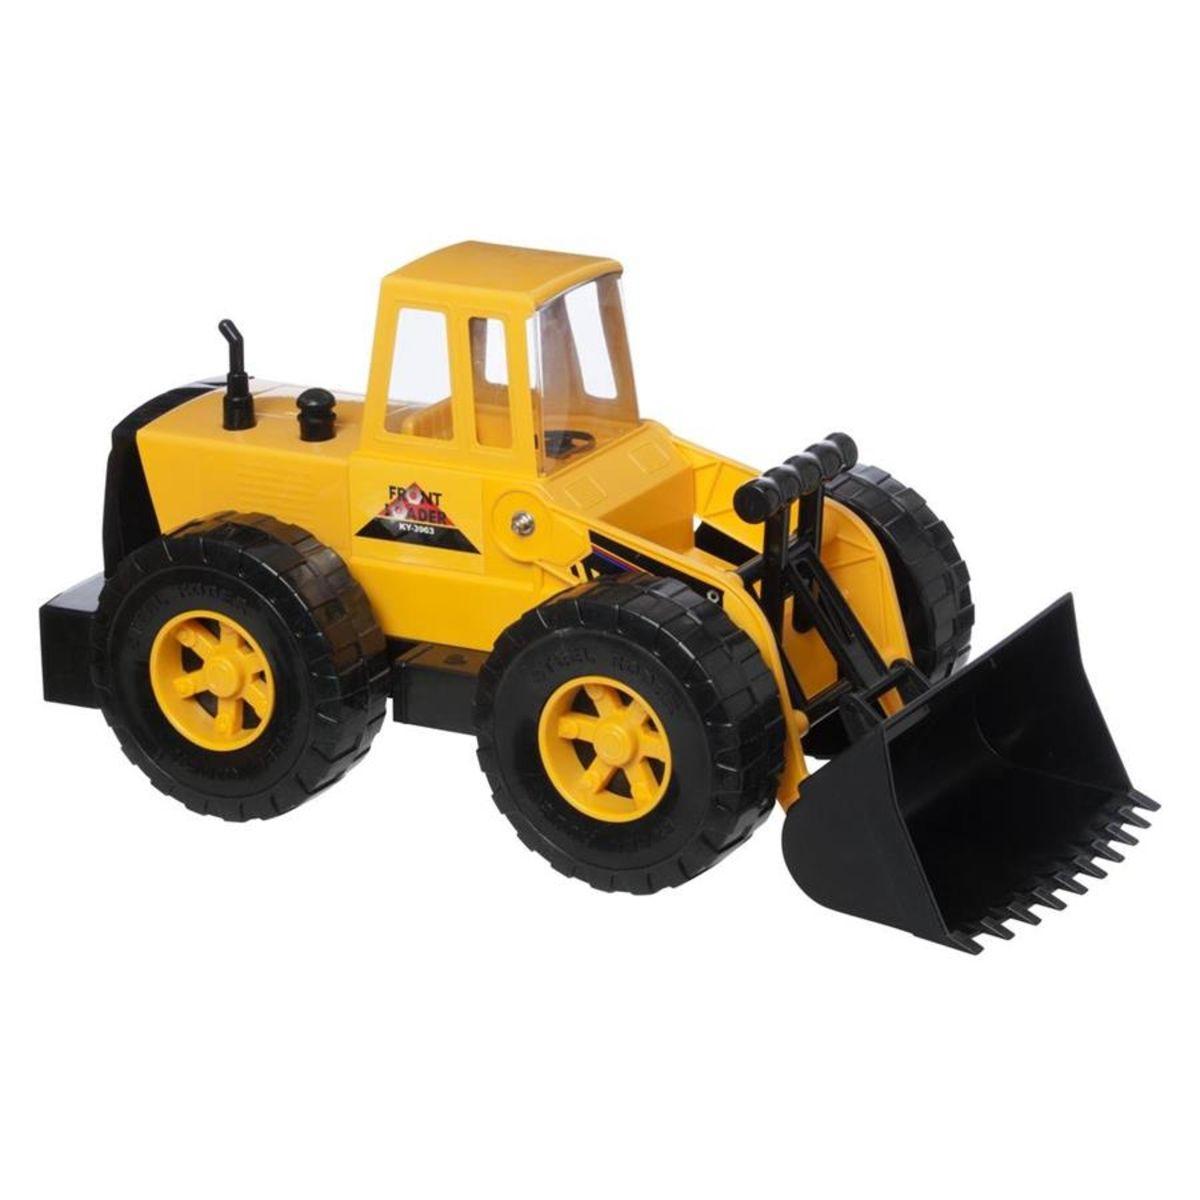 Metal Front Loader Toy cars for kids, Toy trucks, Metal